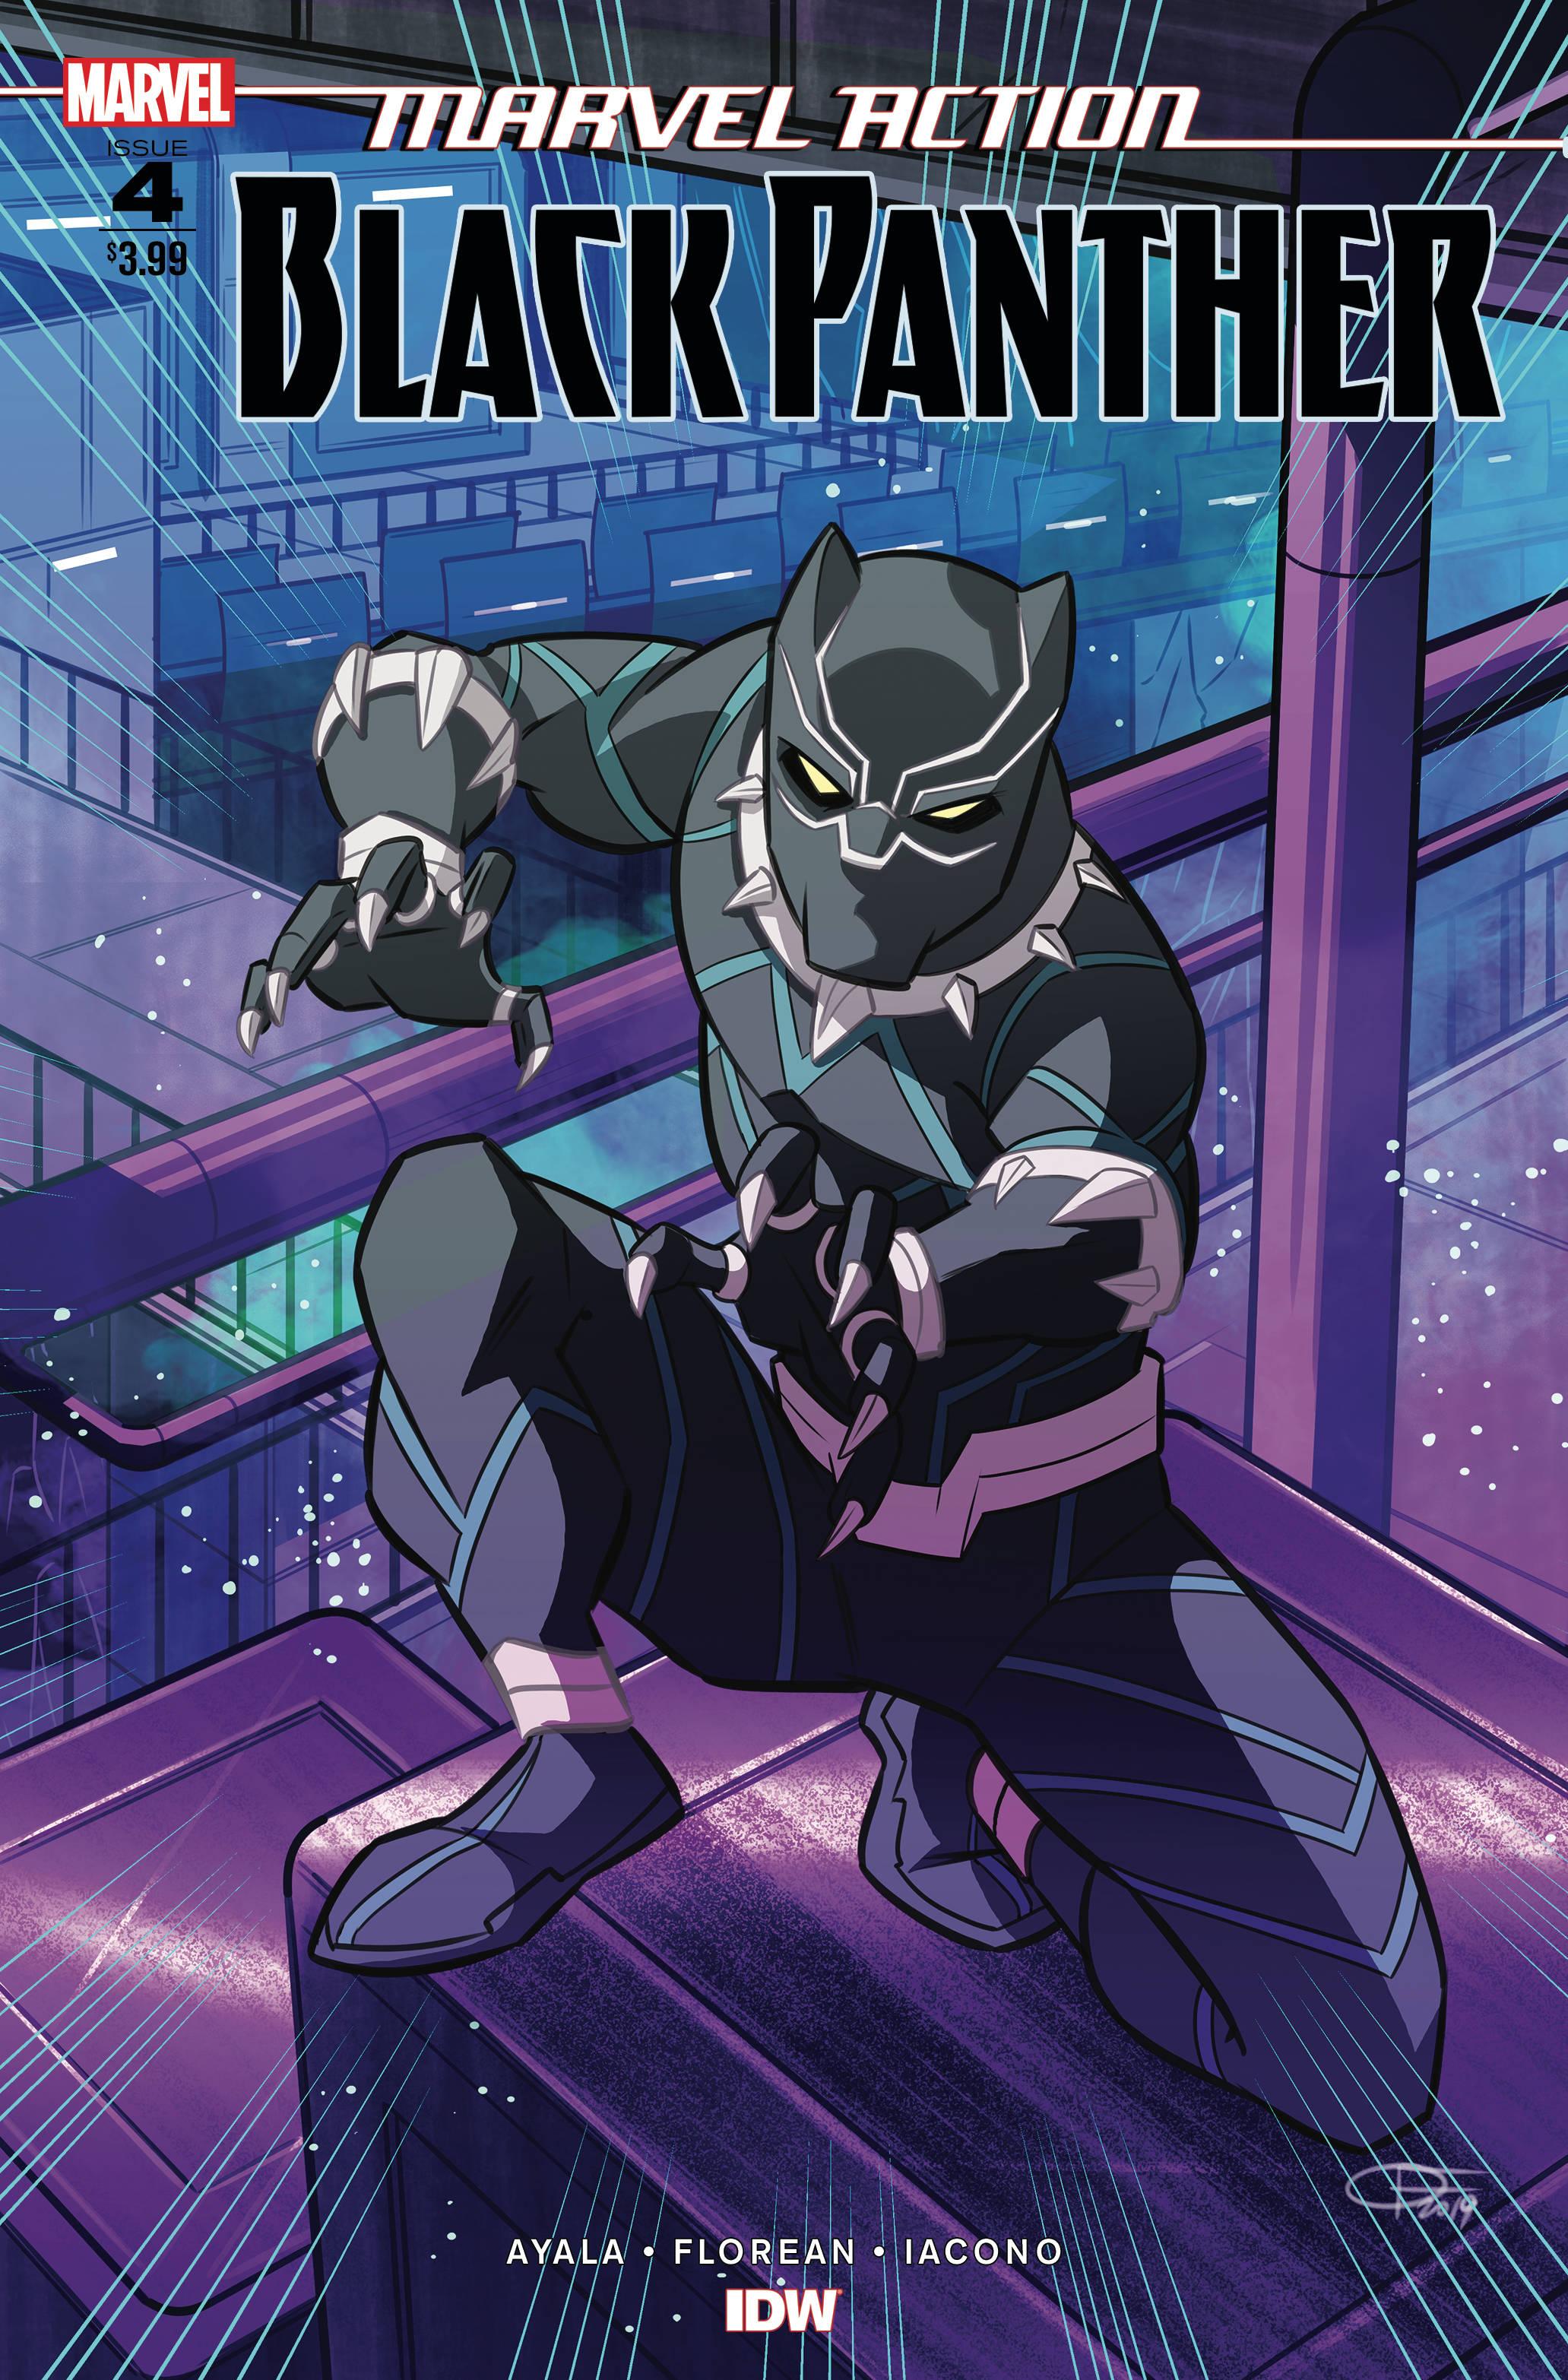 Marvel Action: Black Panther #4 (2019)